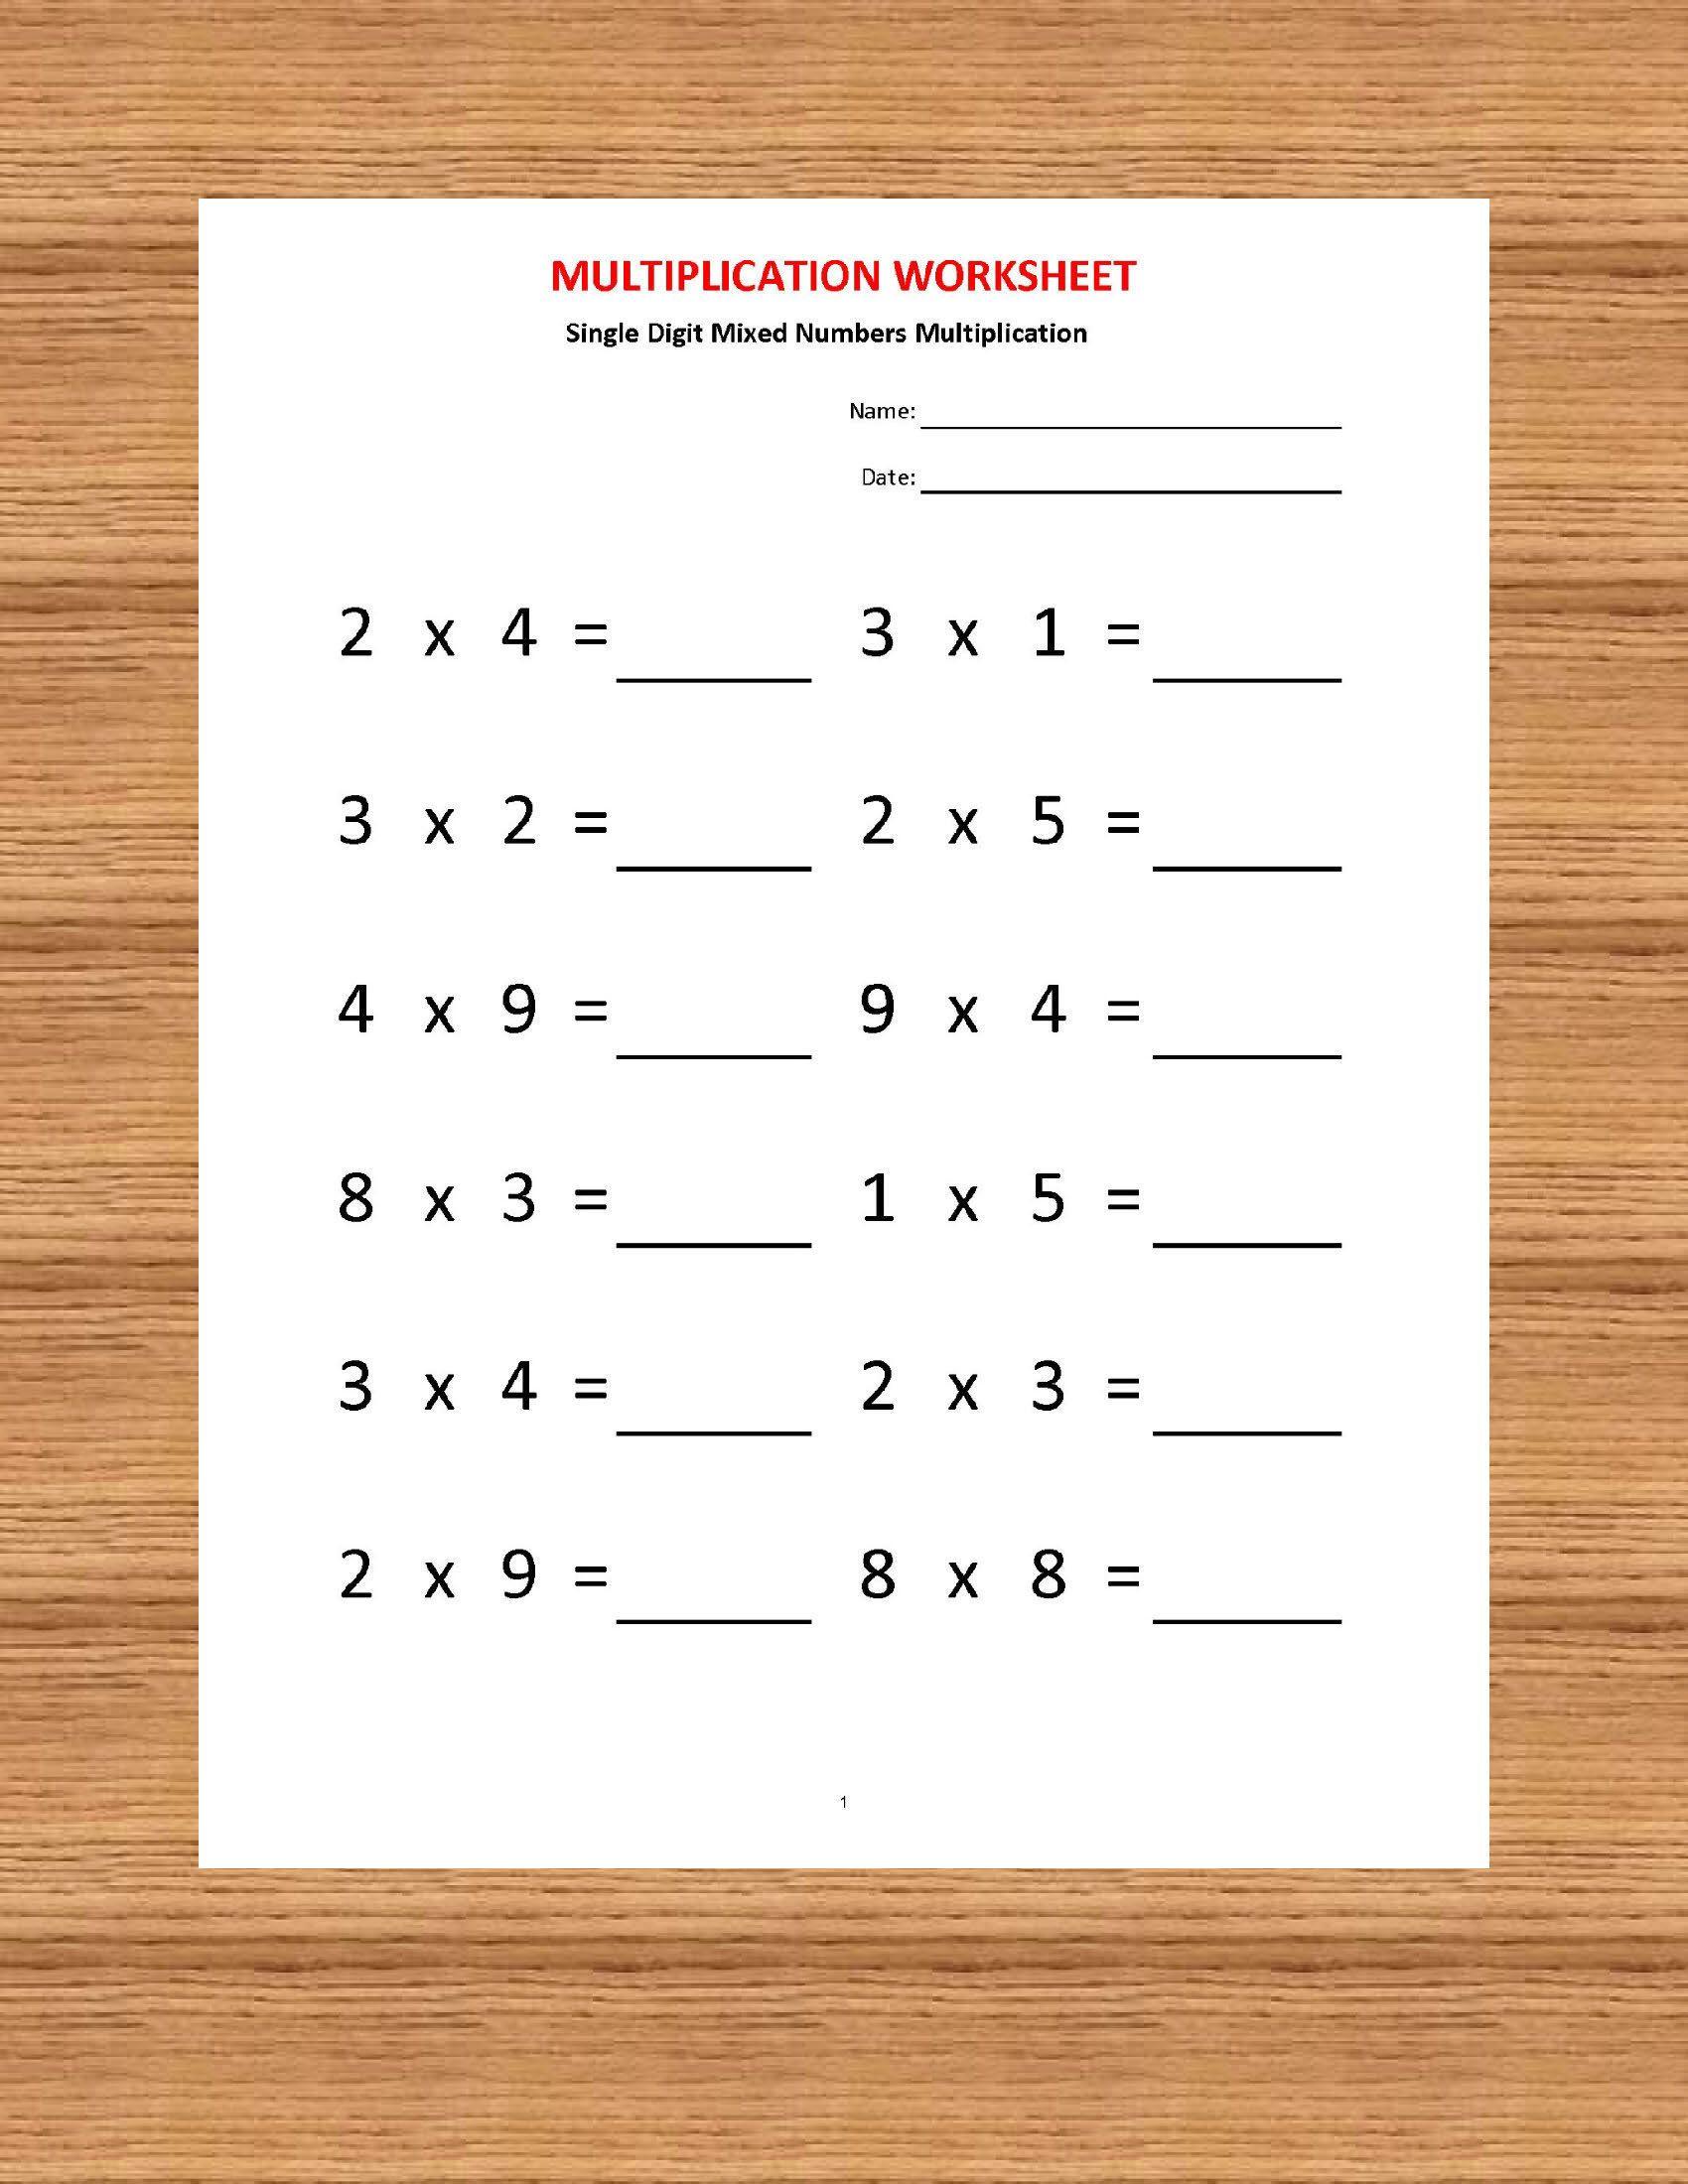 Multiplication Worksheets, Printable Worksheets intended for 4 Multiplication Worksheets Pdf